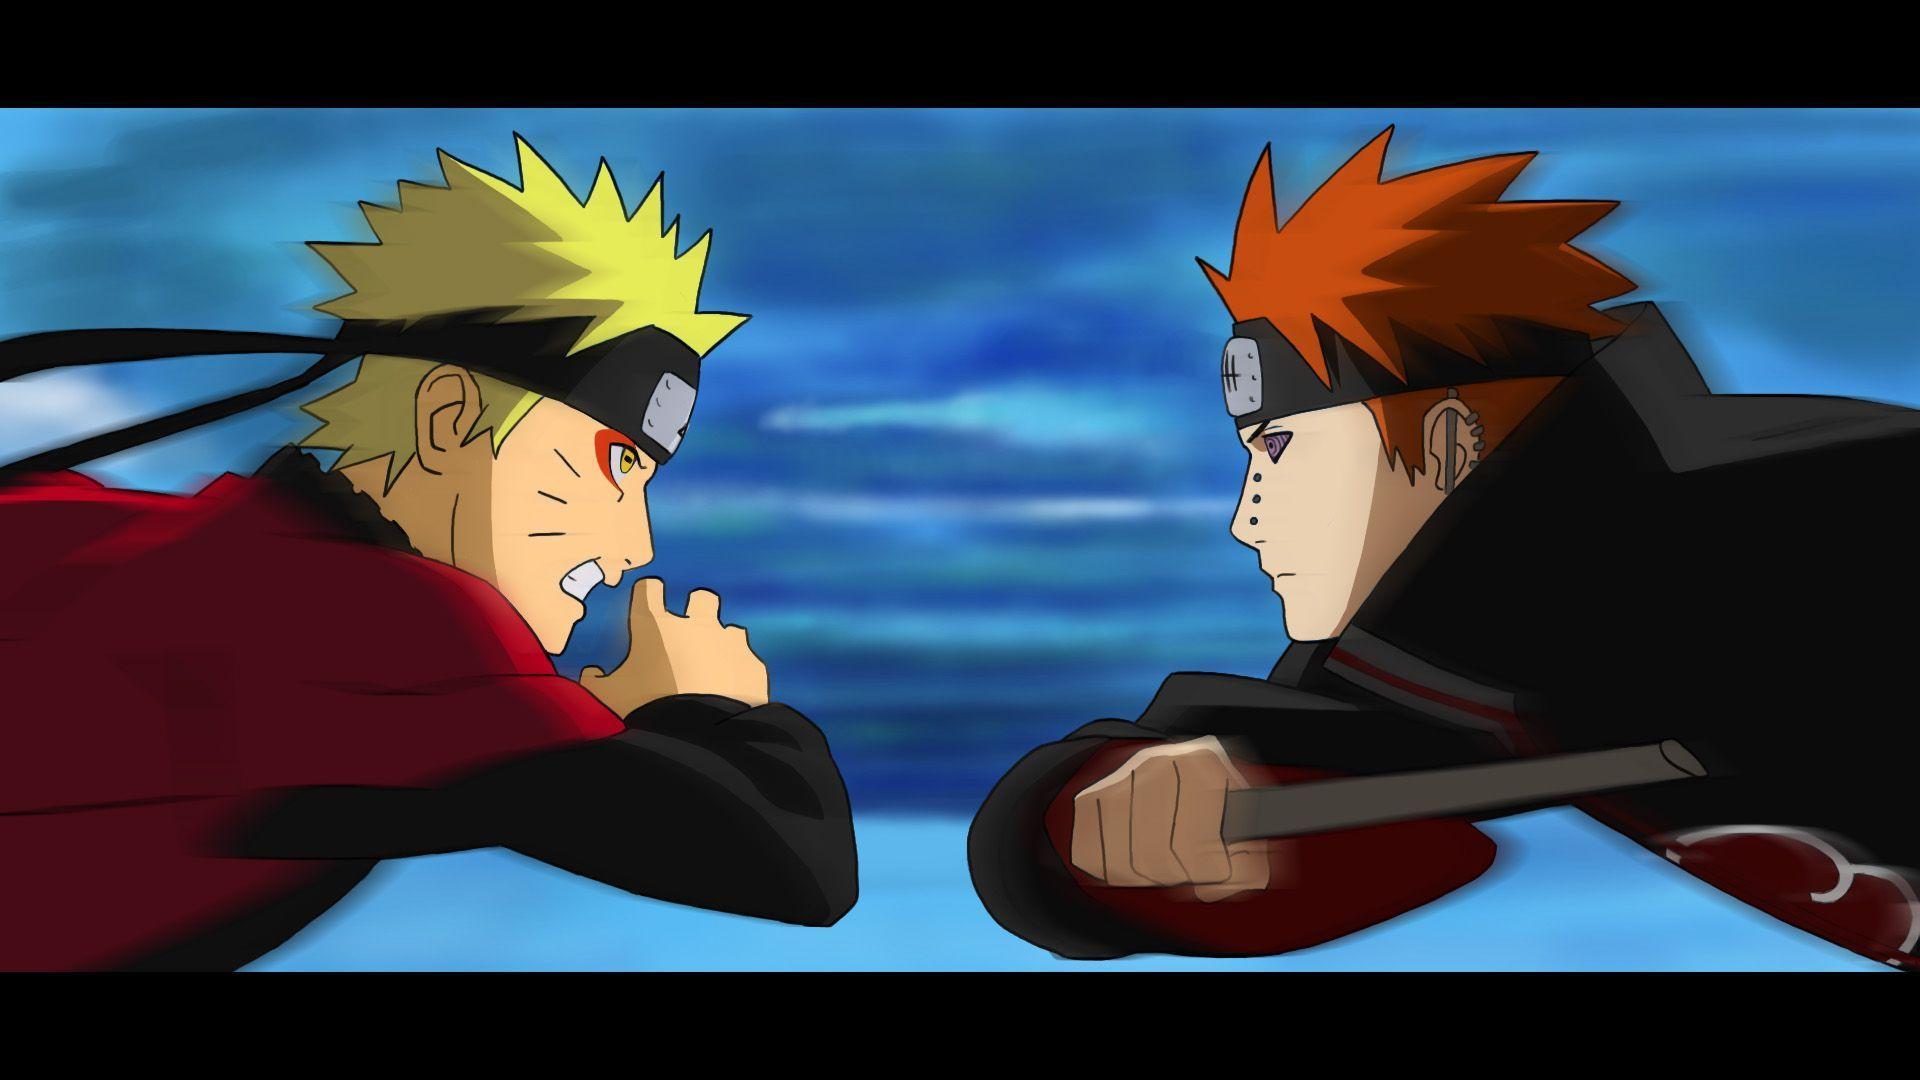 Naruto X Pain Skizze - Novocom.top